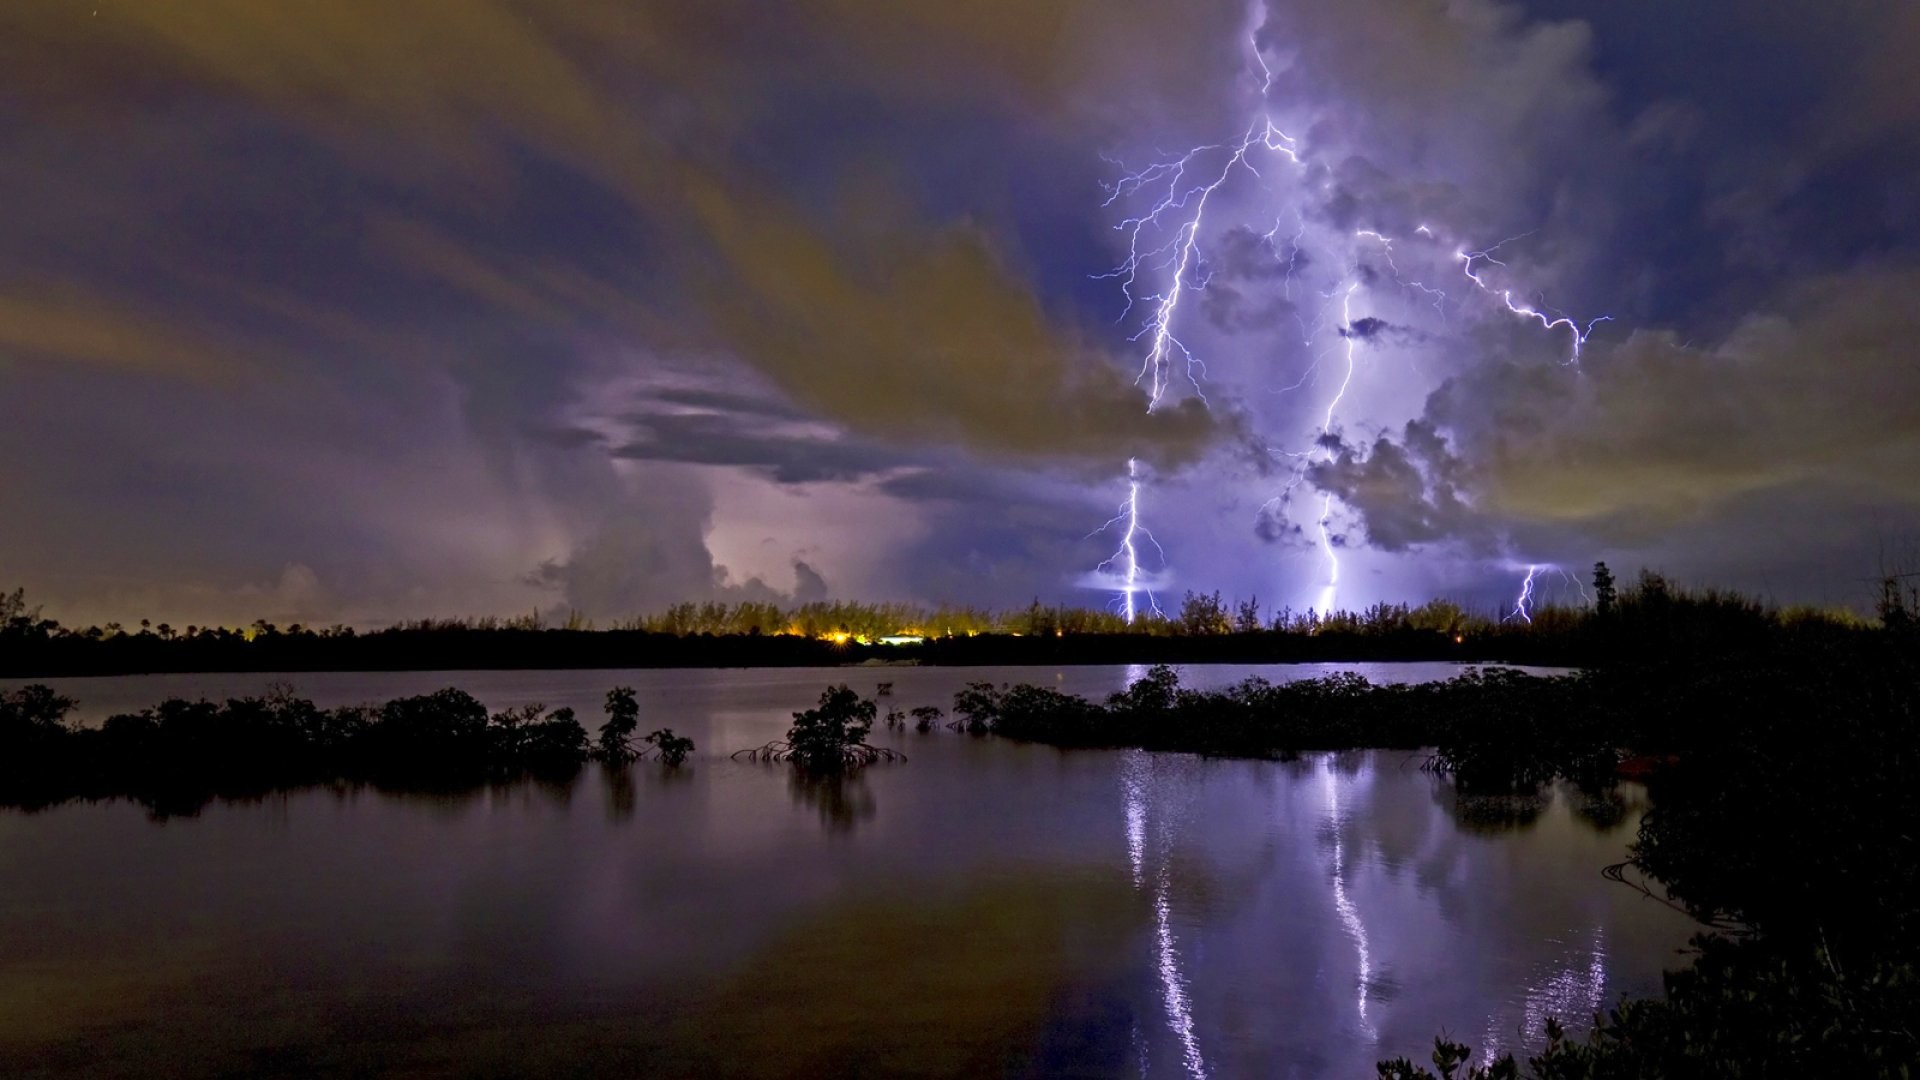 Res: 1920x1080, Lightning storm rain clouds sky nature thunderstorm wallpaper |  |  953404 | WallpaperUP